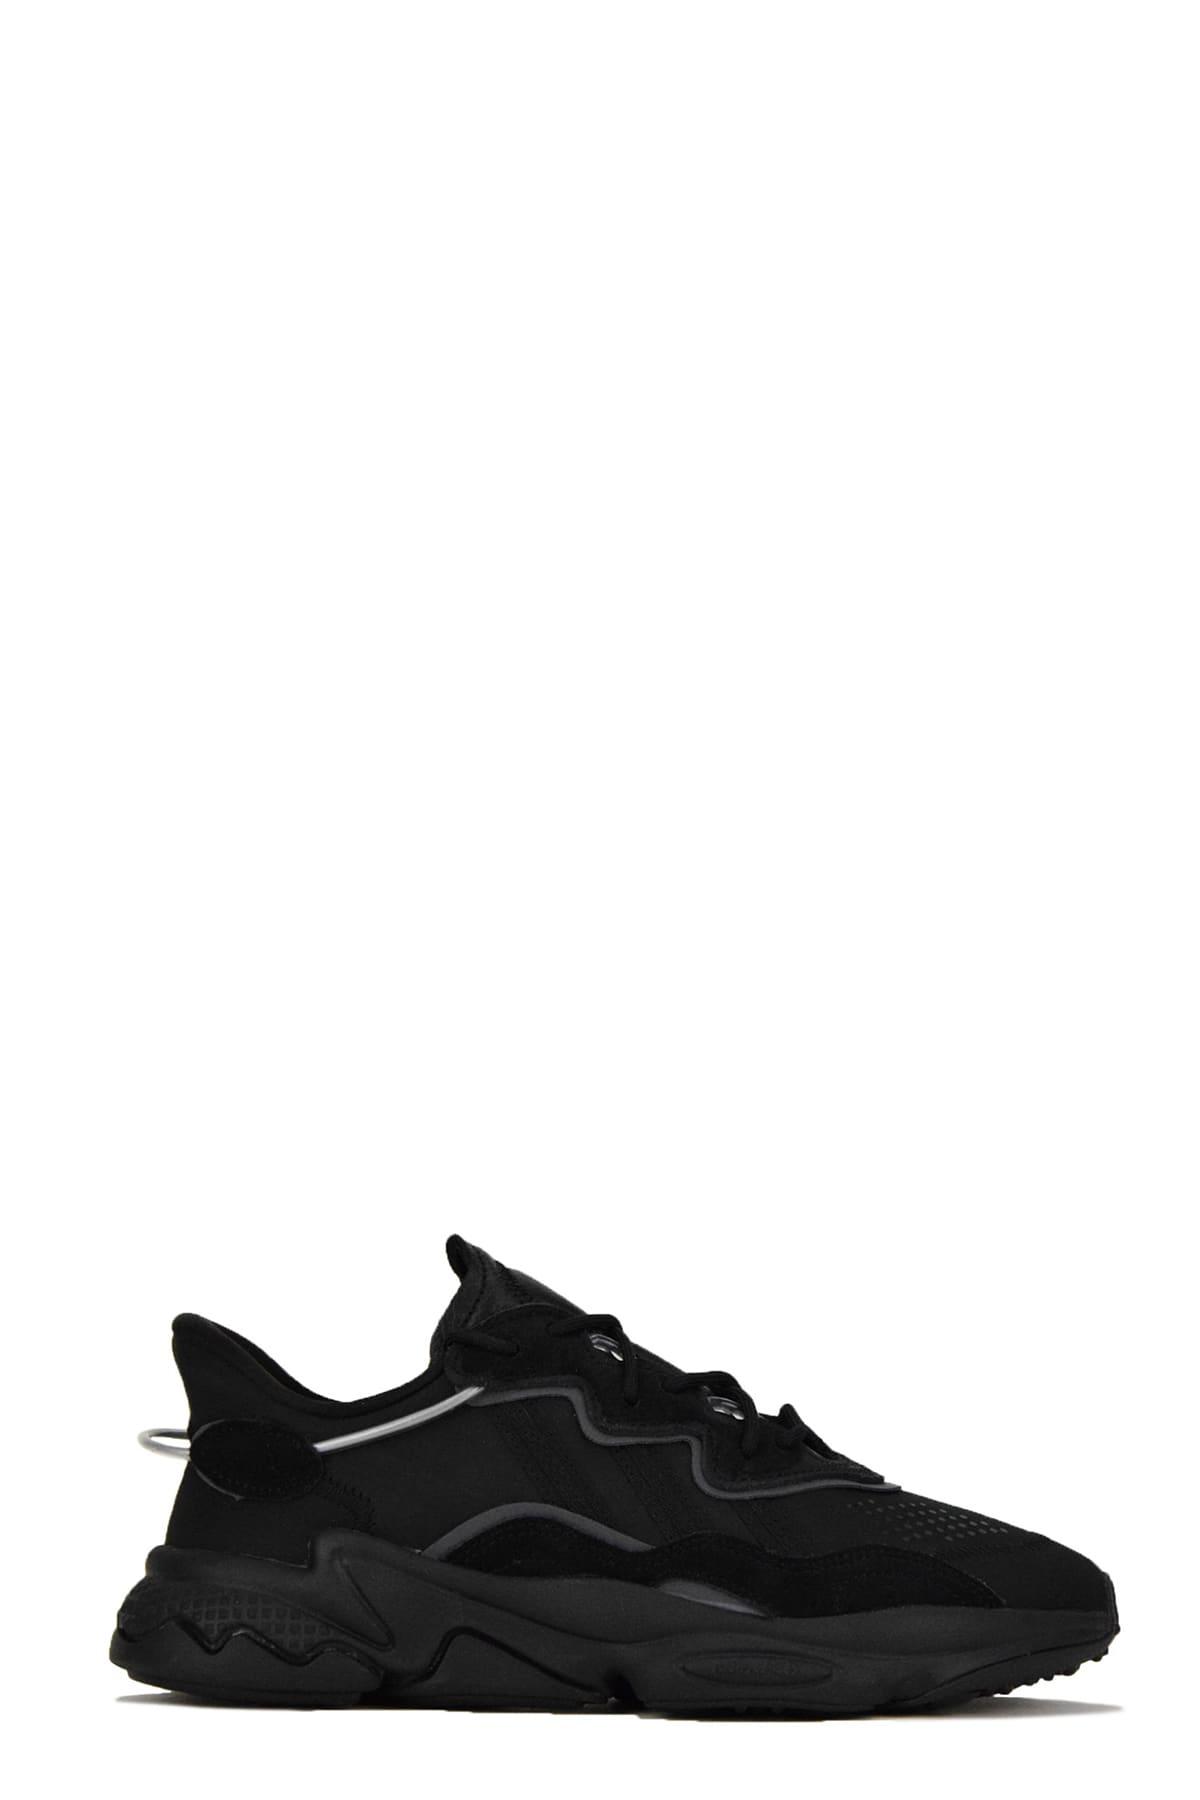 adidas ozweego nero